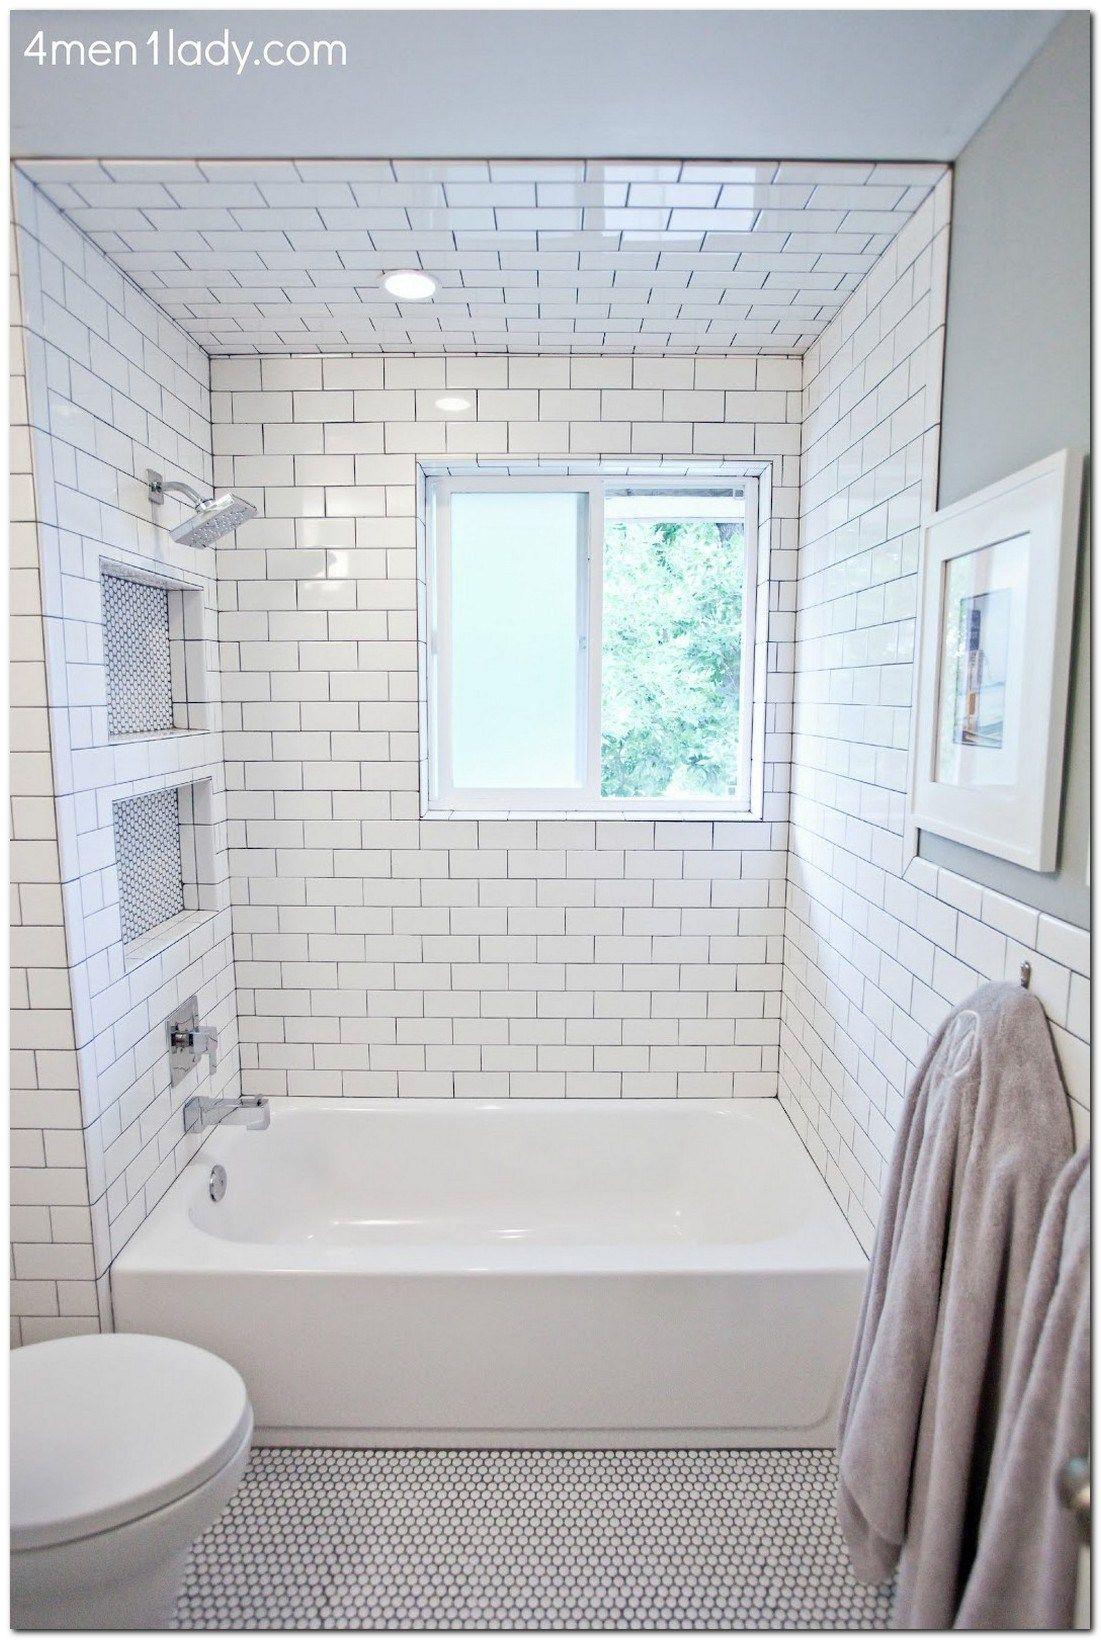 Simple but Great: 100+ Small Bathroom Ideas | Pinterest | Bath ...